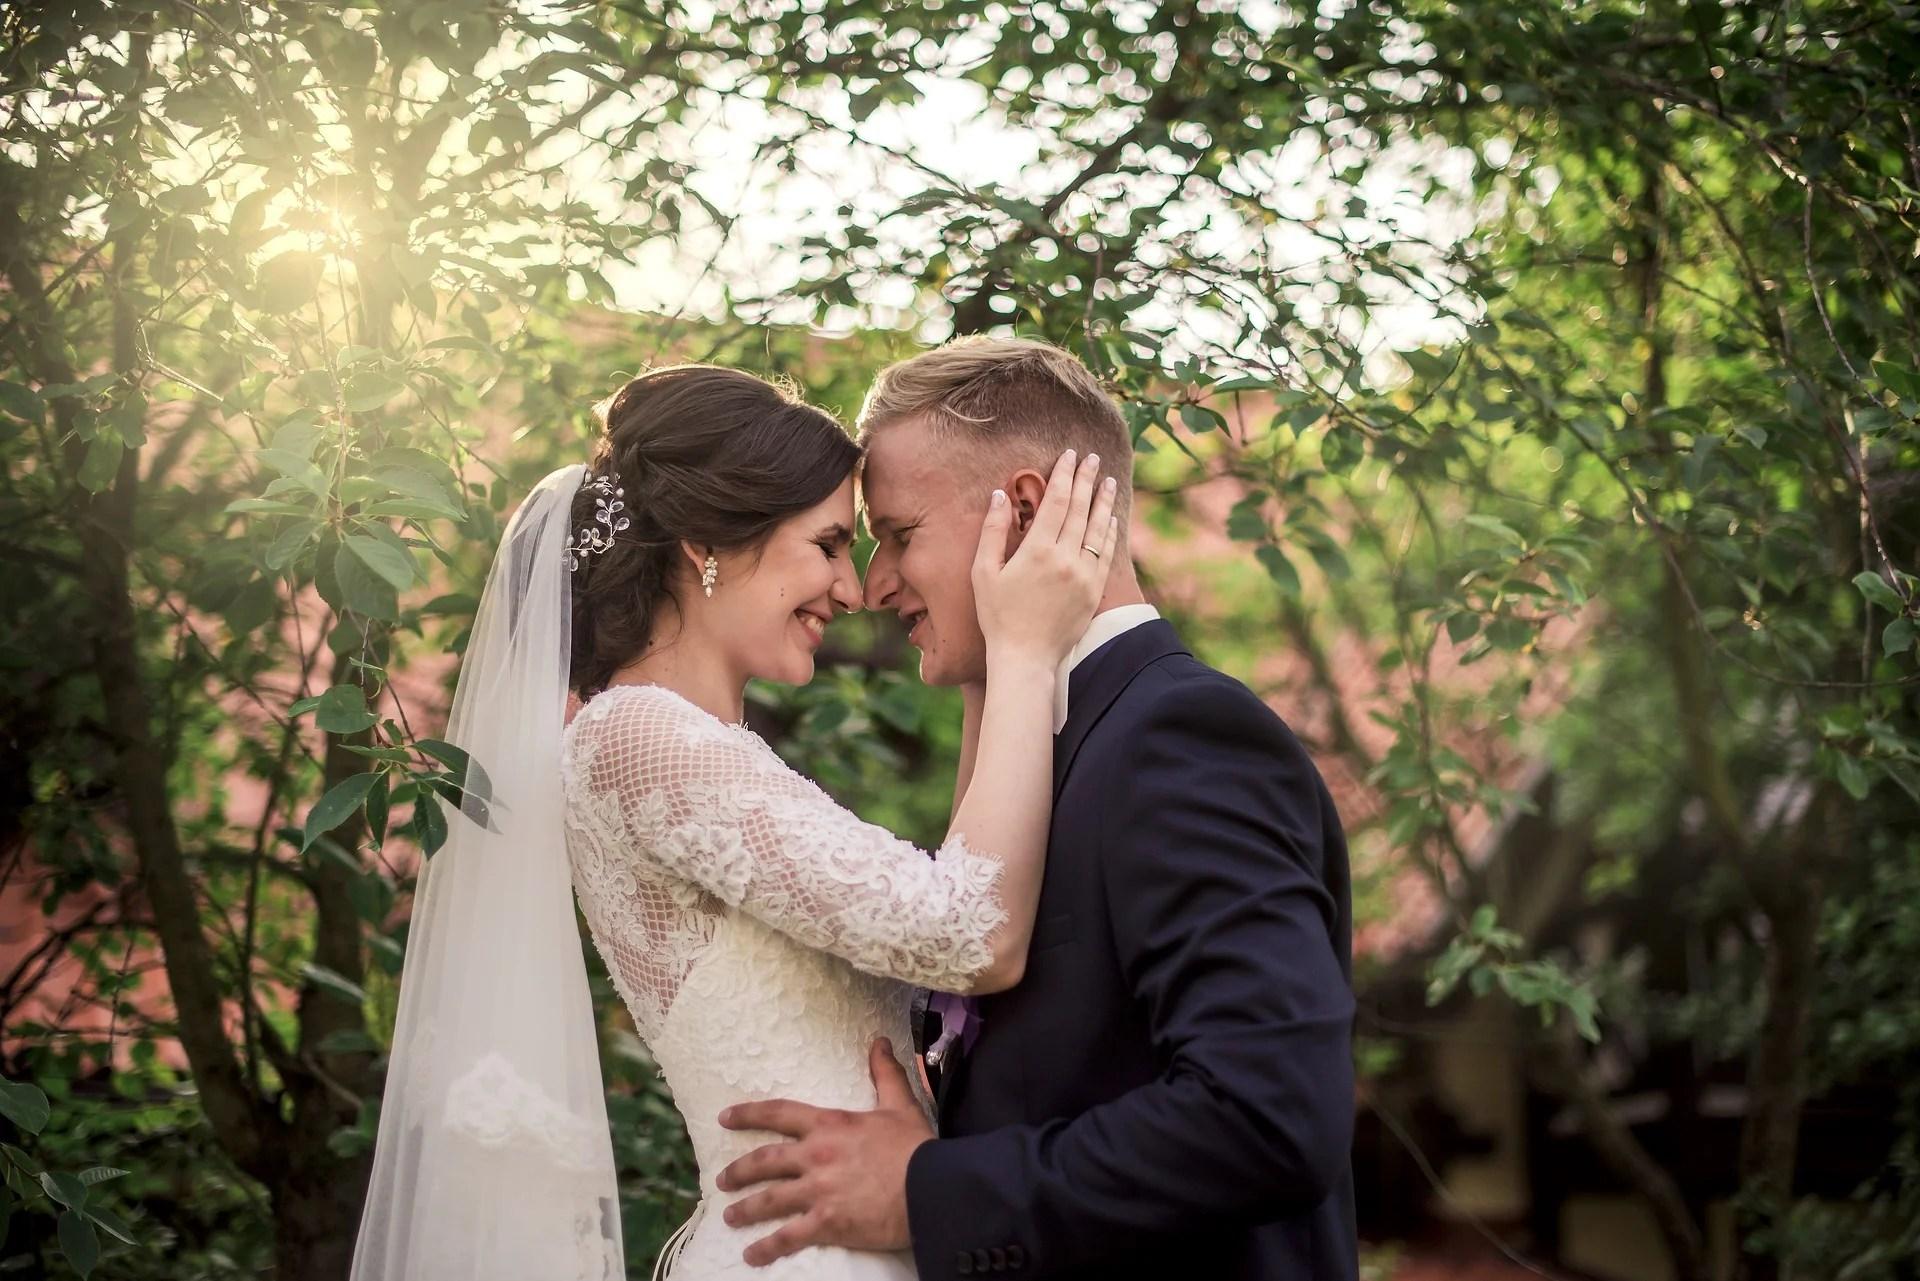 Wedding Backyard - WeddingsAbroad.com